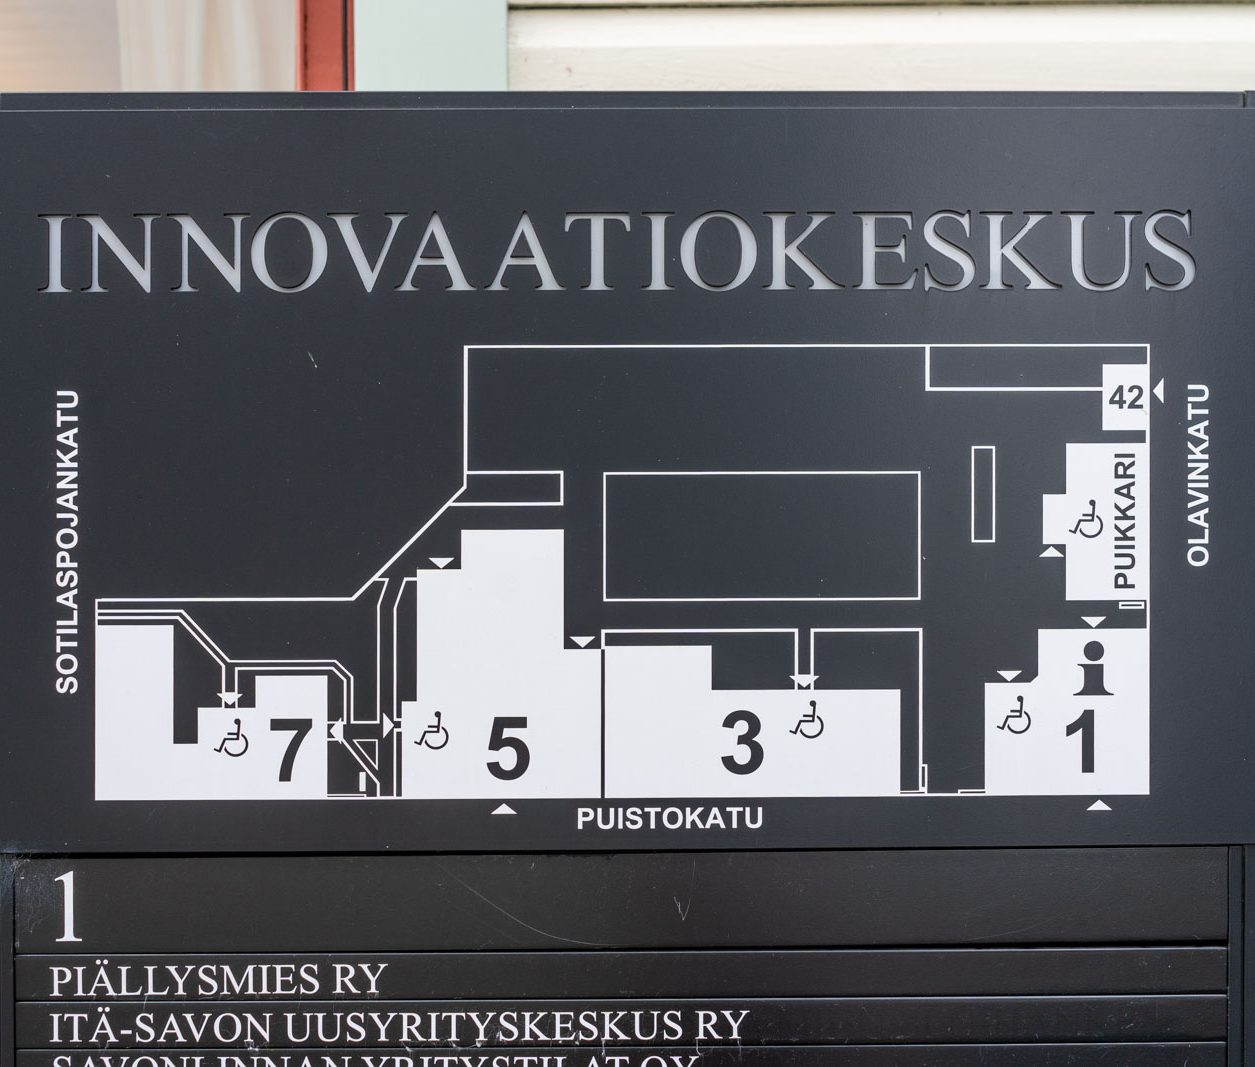 savonlinnan-innovaatiokeskus-10